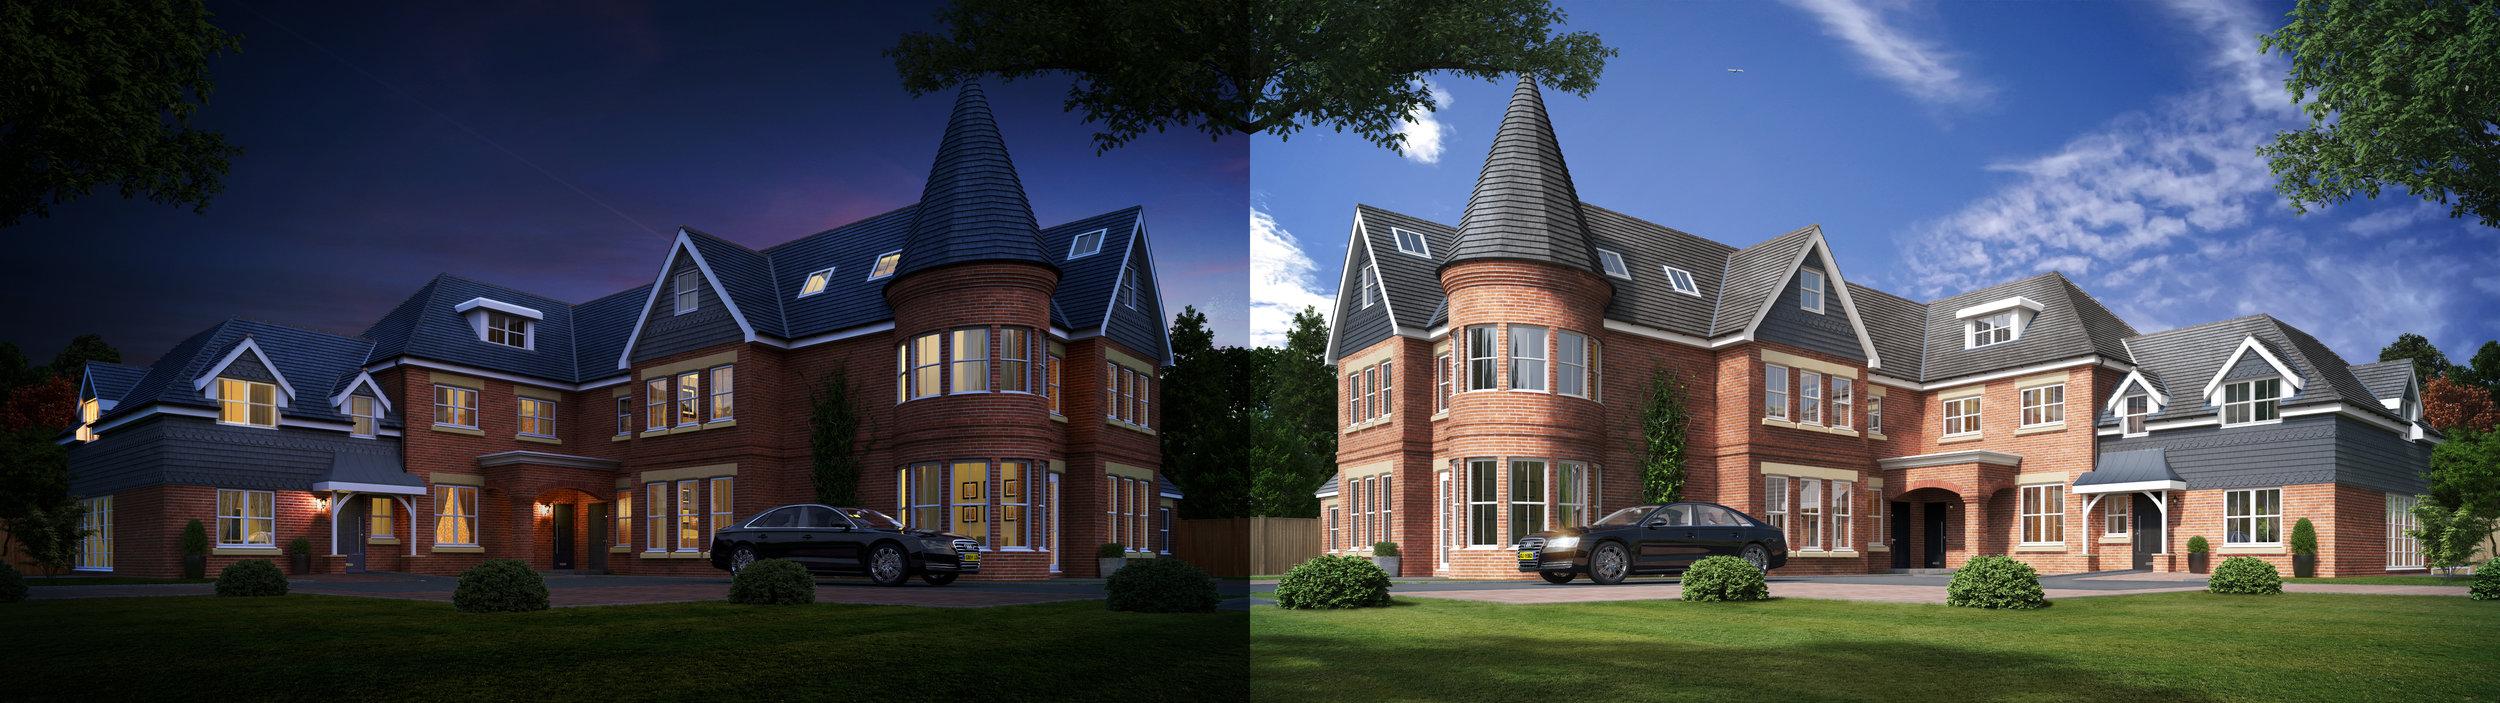 Large House CGI - Night and Day Marketing Shots.jpg